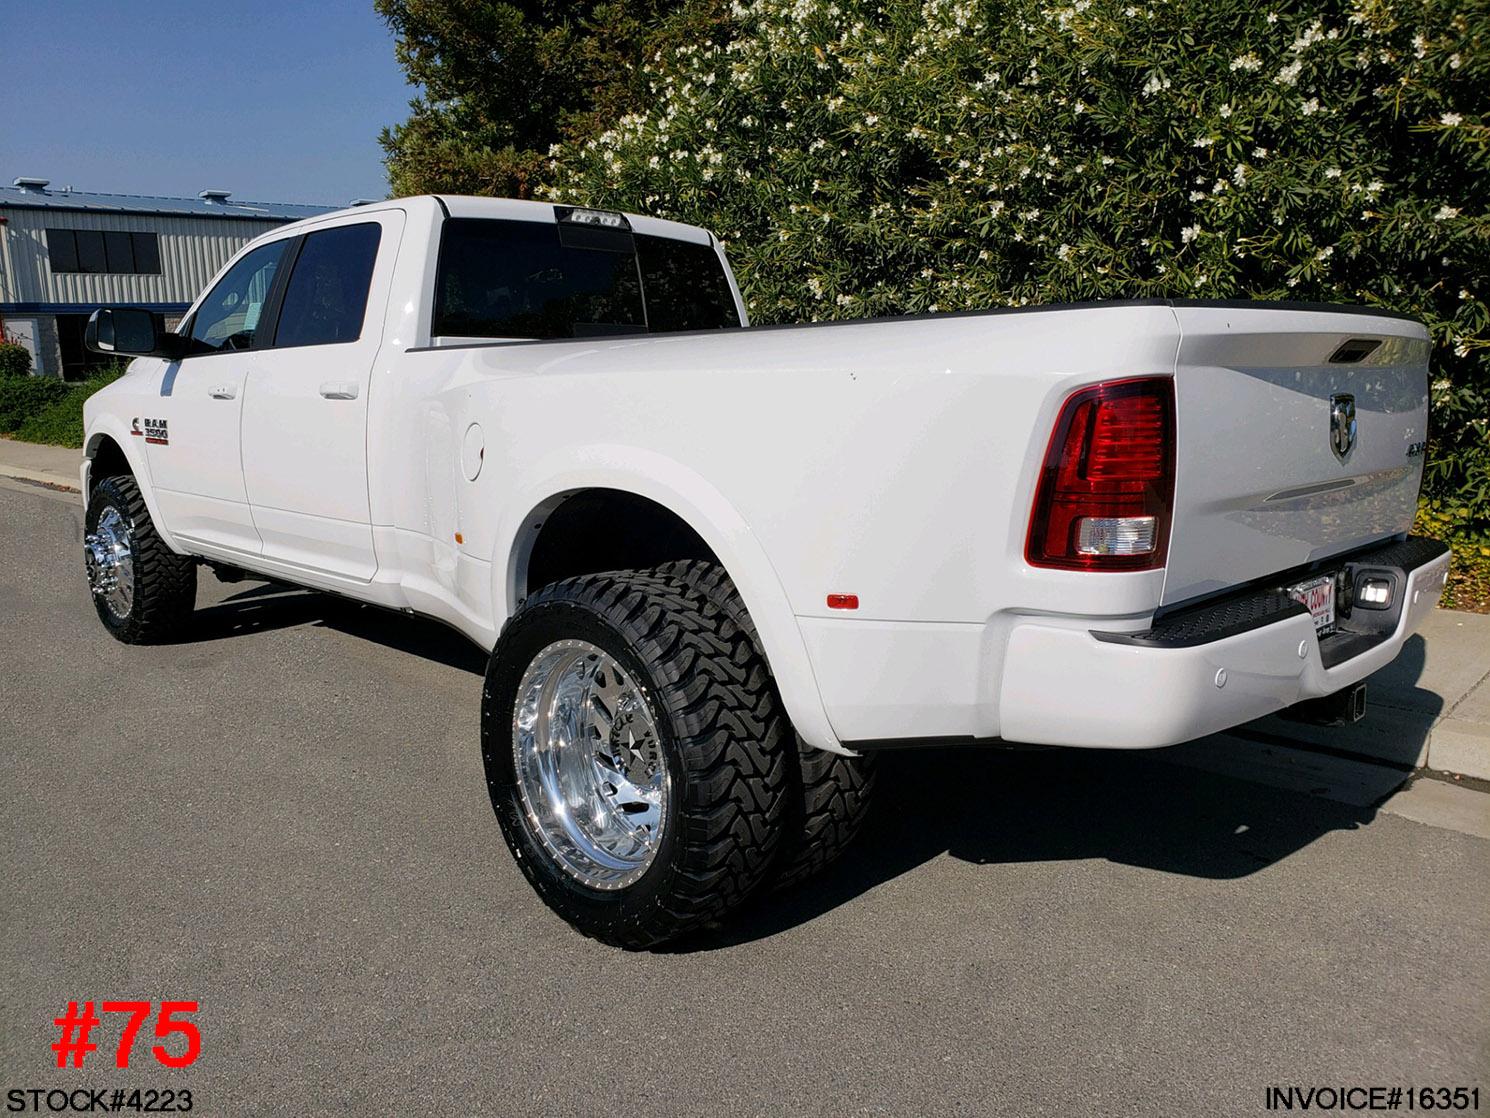 4223-2018 RAM 3500 MEGA CAB DUALLY